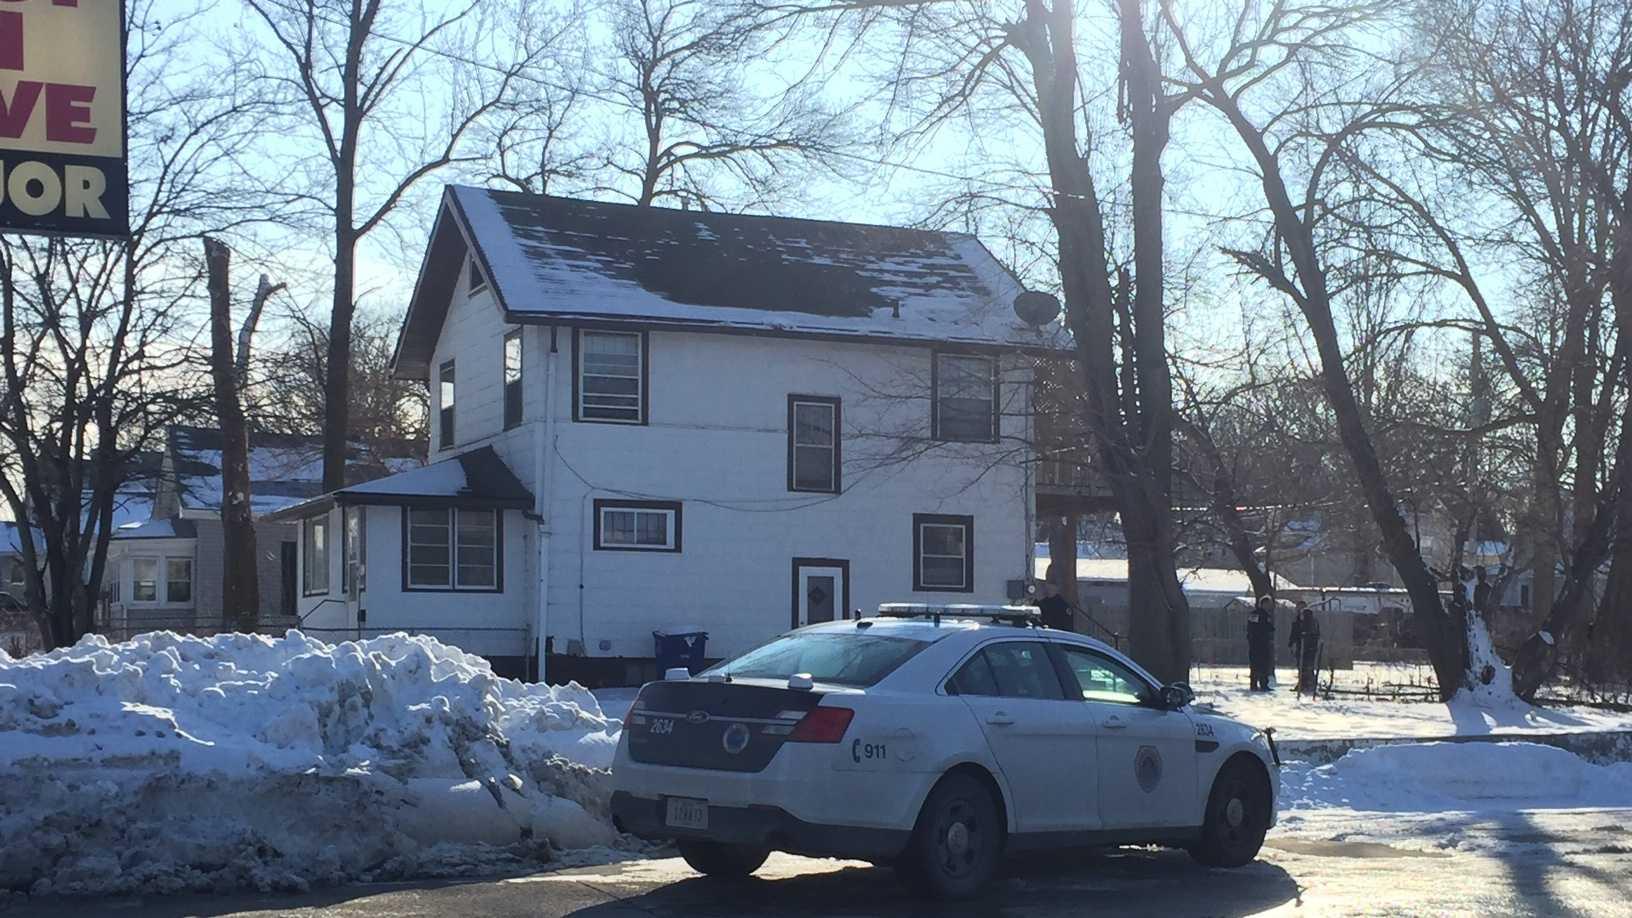 Shooting victim found in neighborhood Thursday.